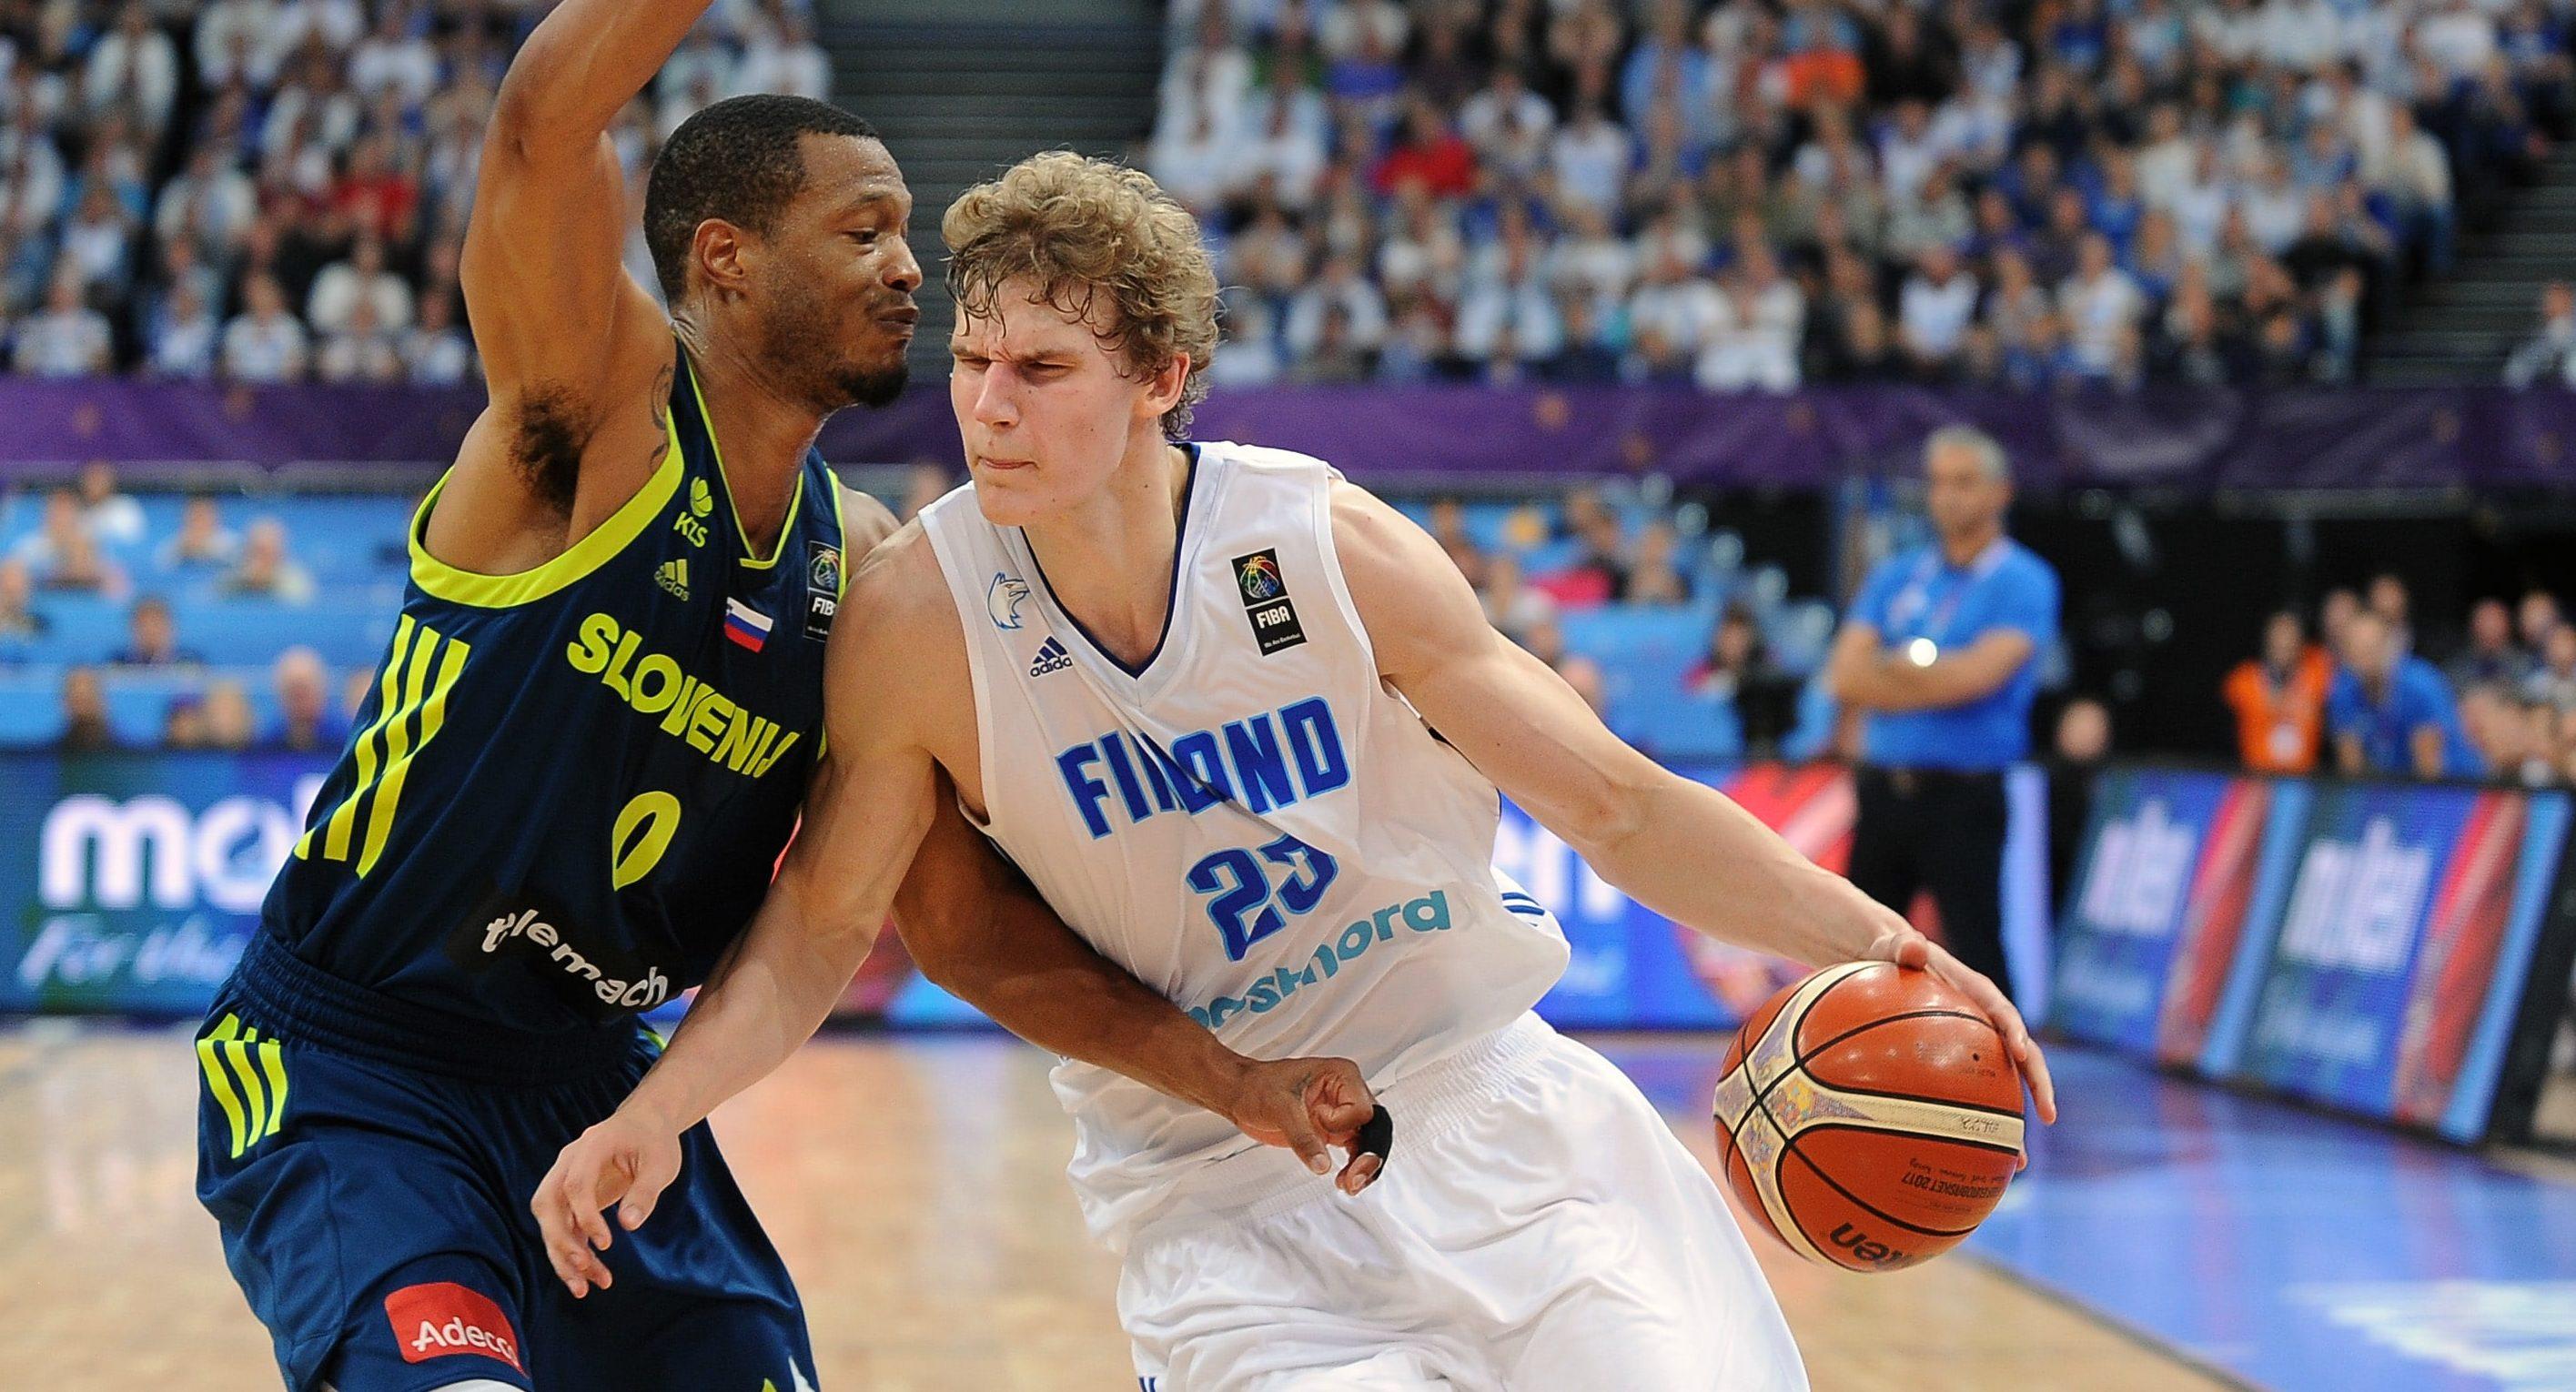 Lauri Markkanen injured in EuroBasket, will play in next game